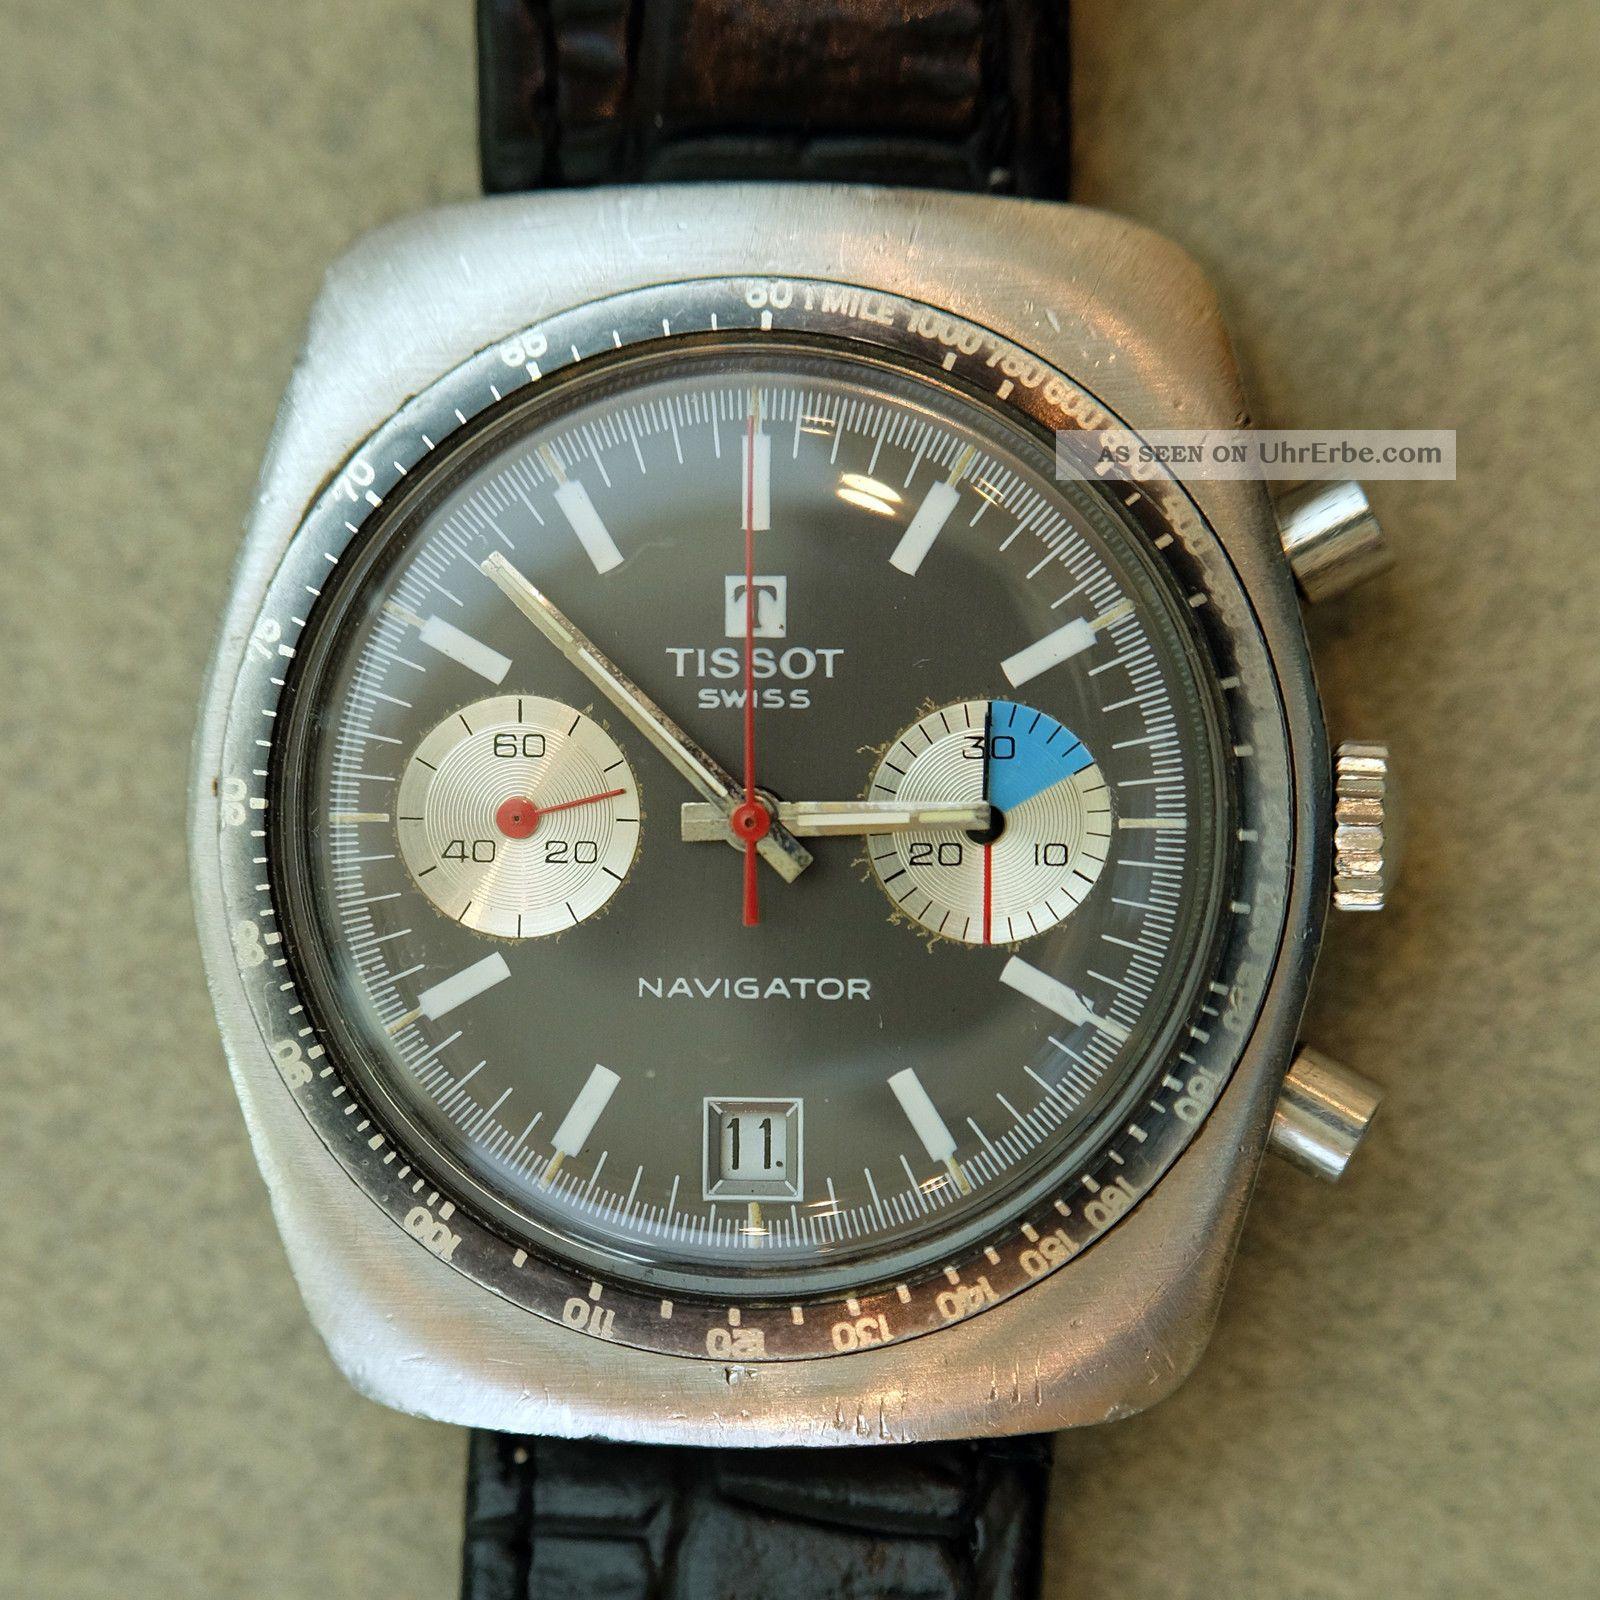 Tissot Navigator,  Valjoux 7734 Edelstahlgehäuse Oversize 70er Cult - Chronograph Armbanduhren Bild